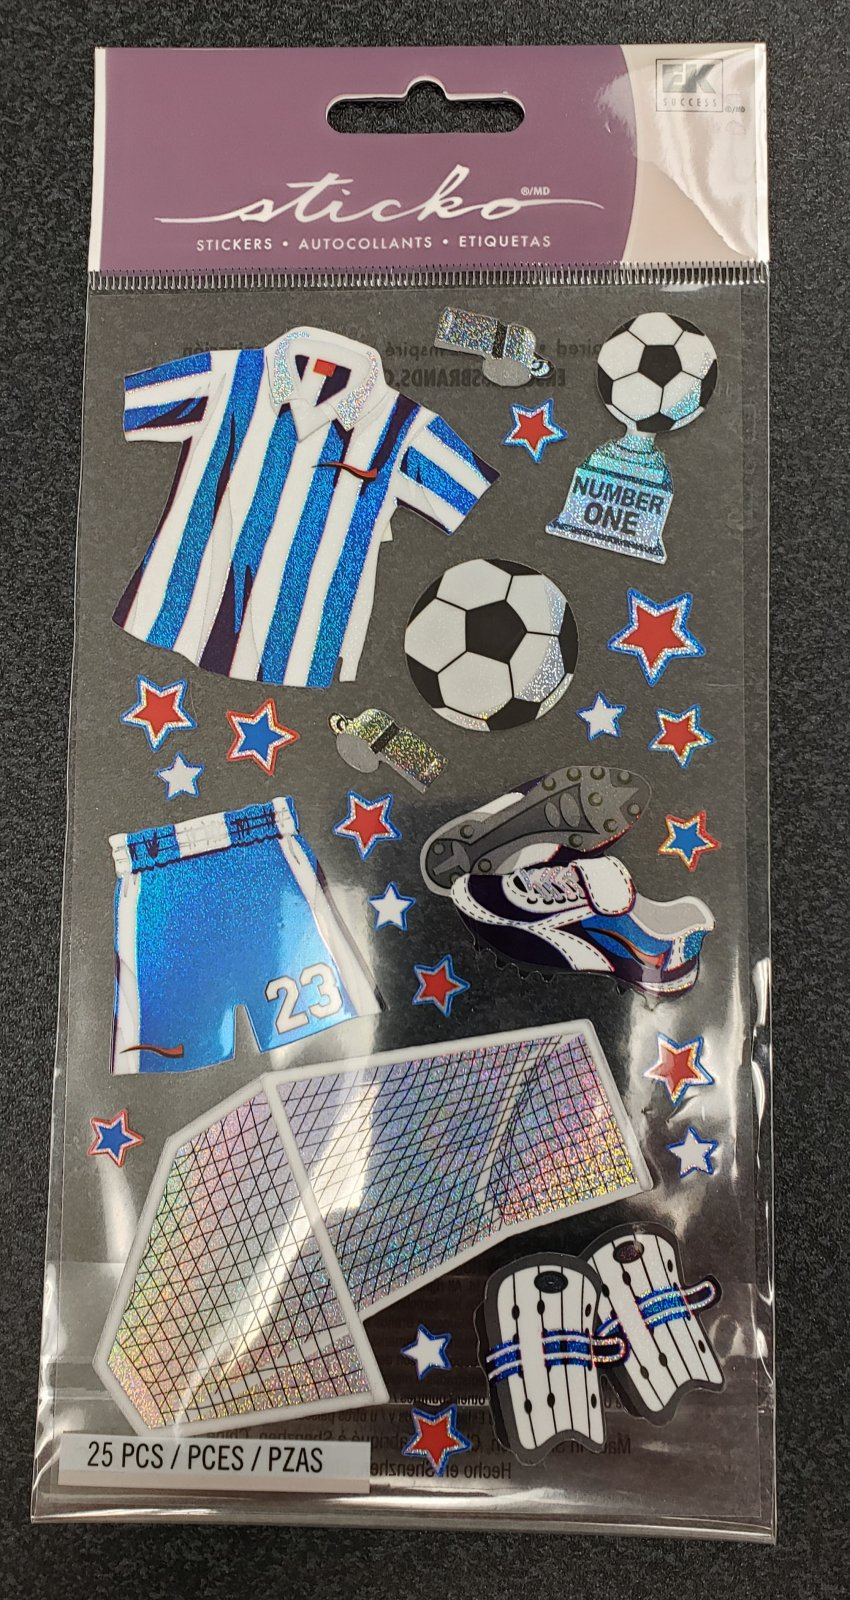 Sticko Soccer Gear